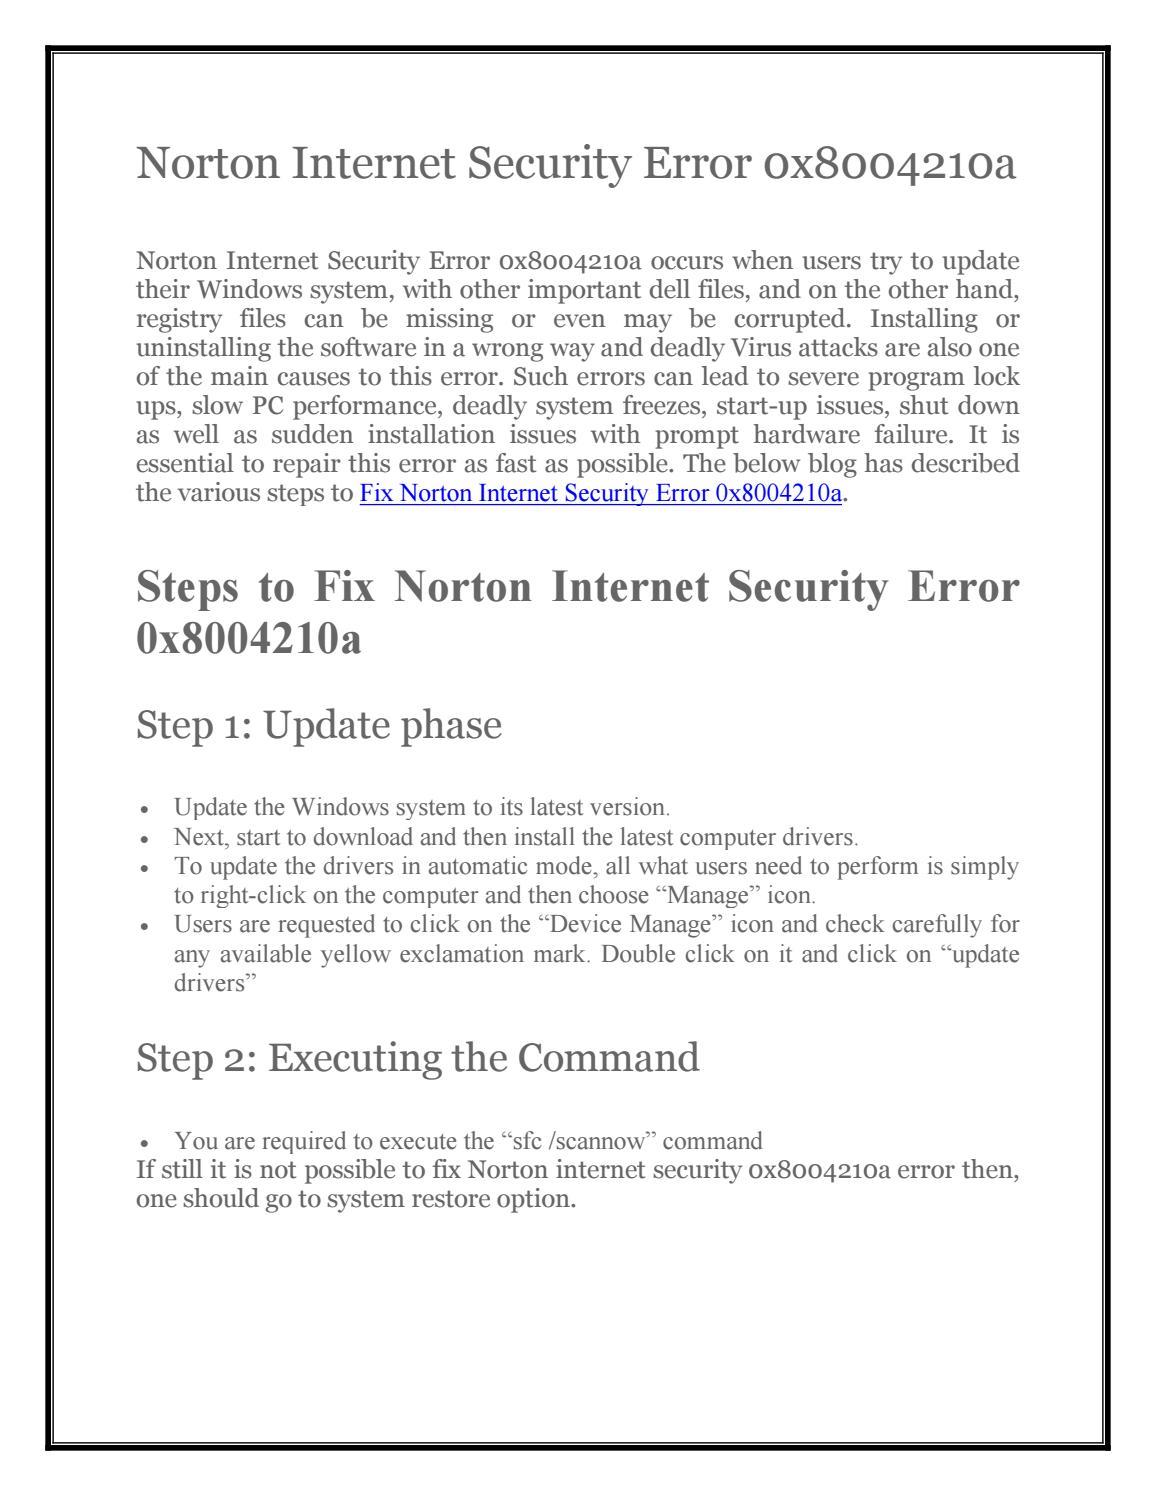 how to fix error 0x8004210a